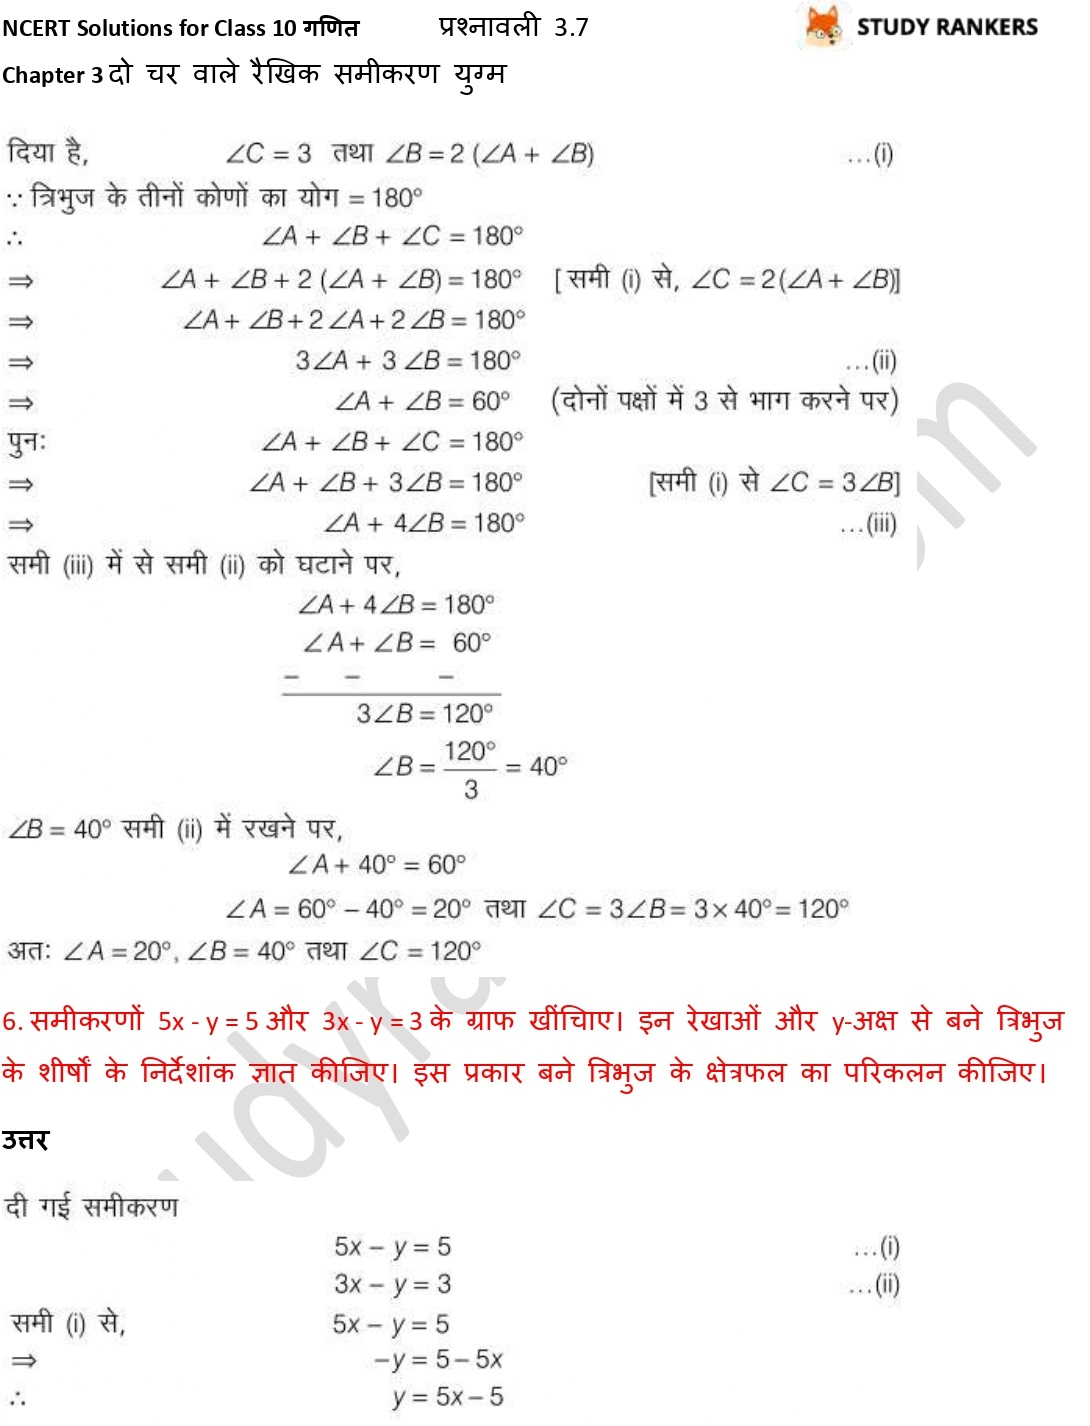 NCERT Solutions for Class 10 Maths Chapter 3 दो चर वाले रैखिक समीकरण युग्म प्रश्नावली 3.7 Part 5